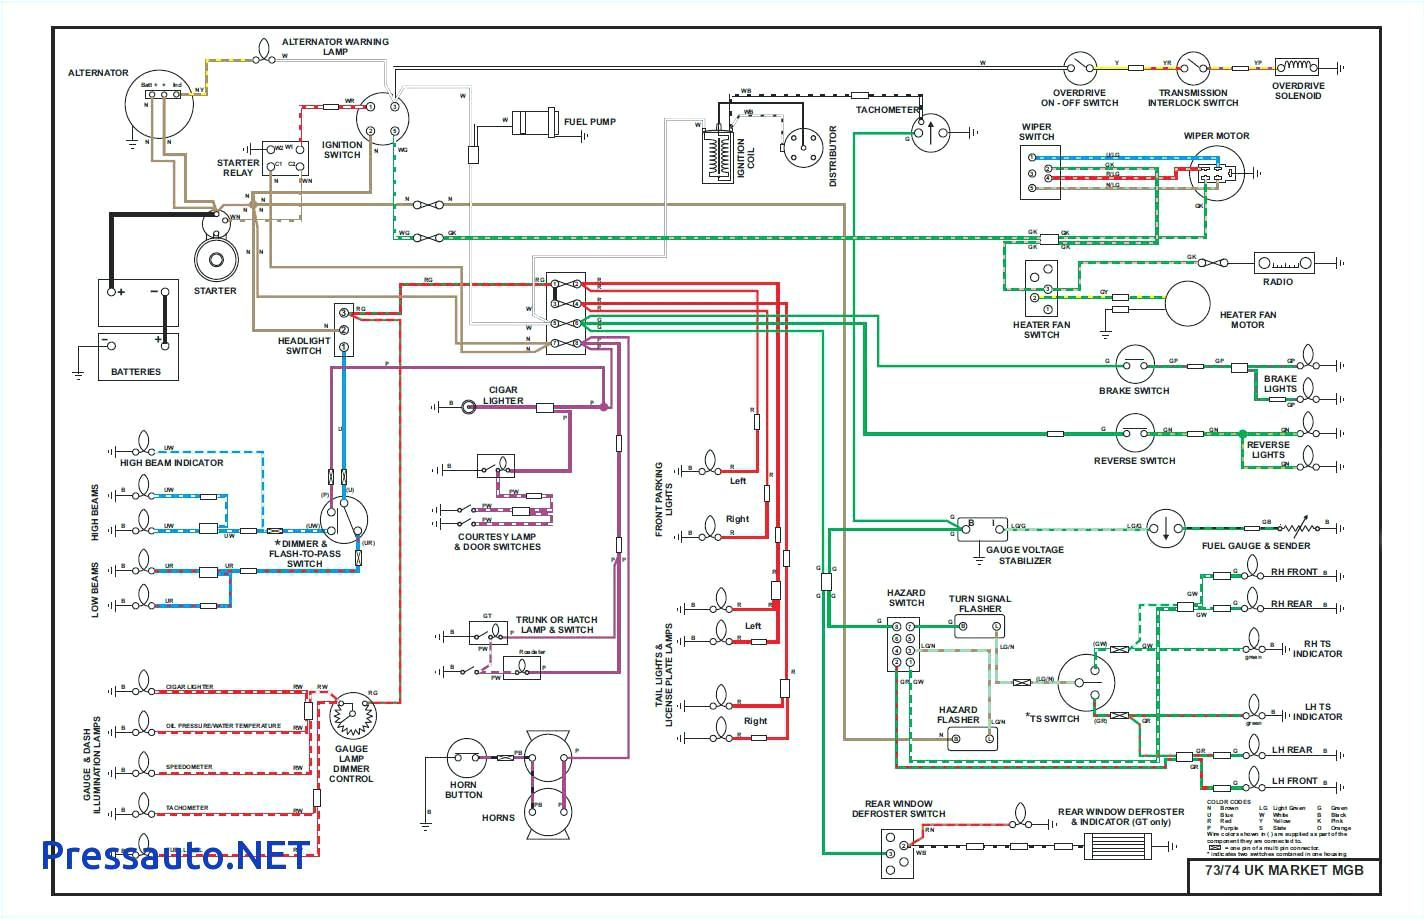 renault trafic wiring loom diagram wiring diagram files renault trafic wiring loom diagram